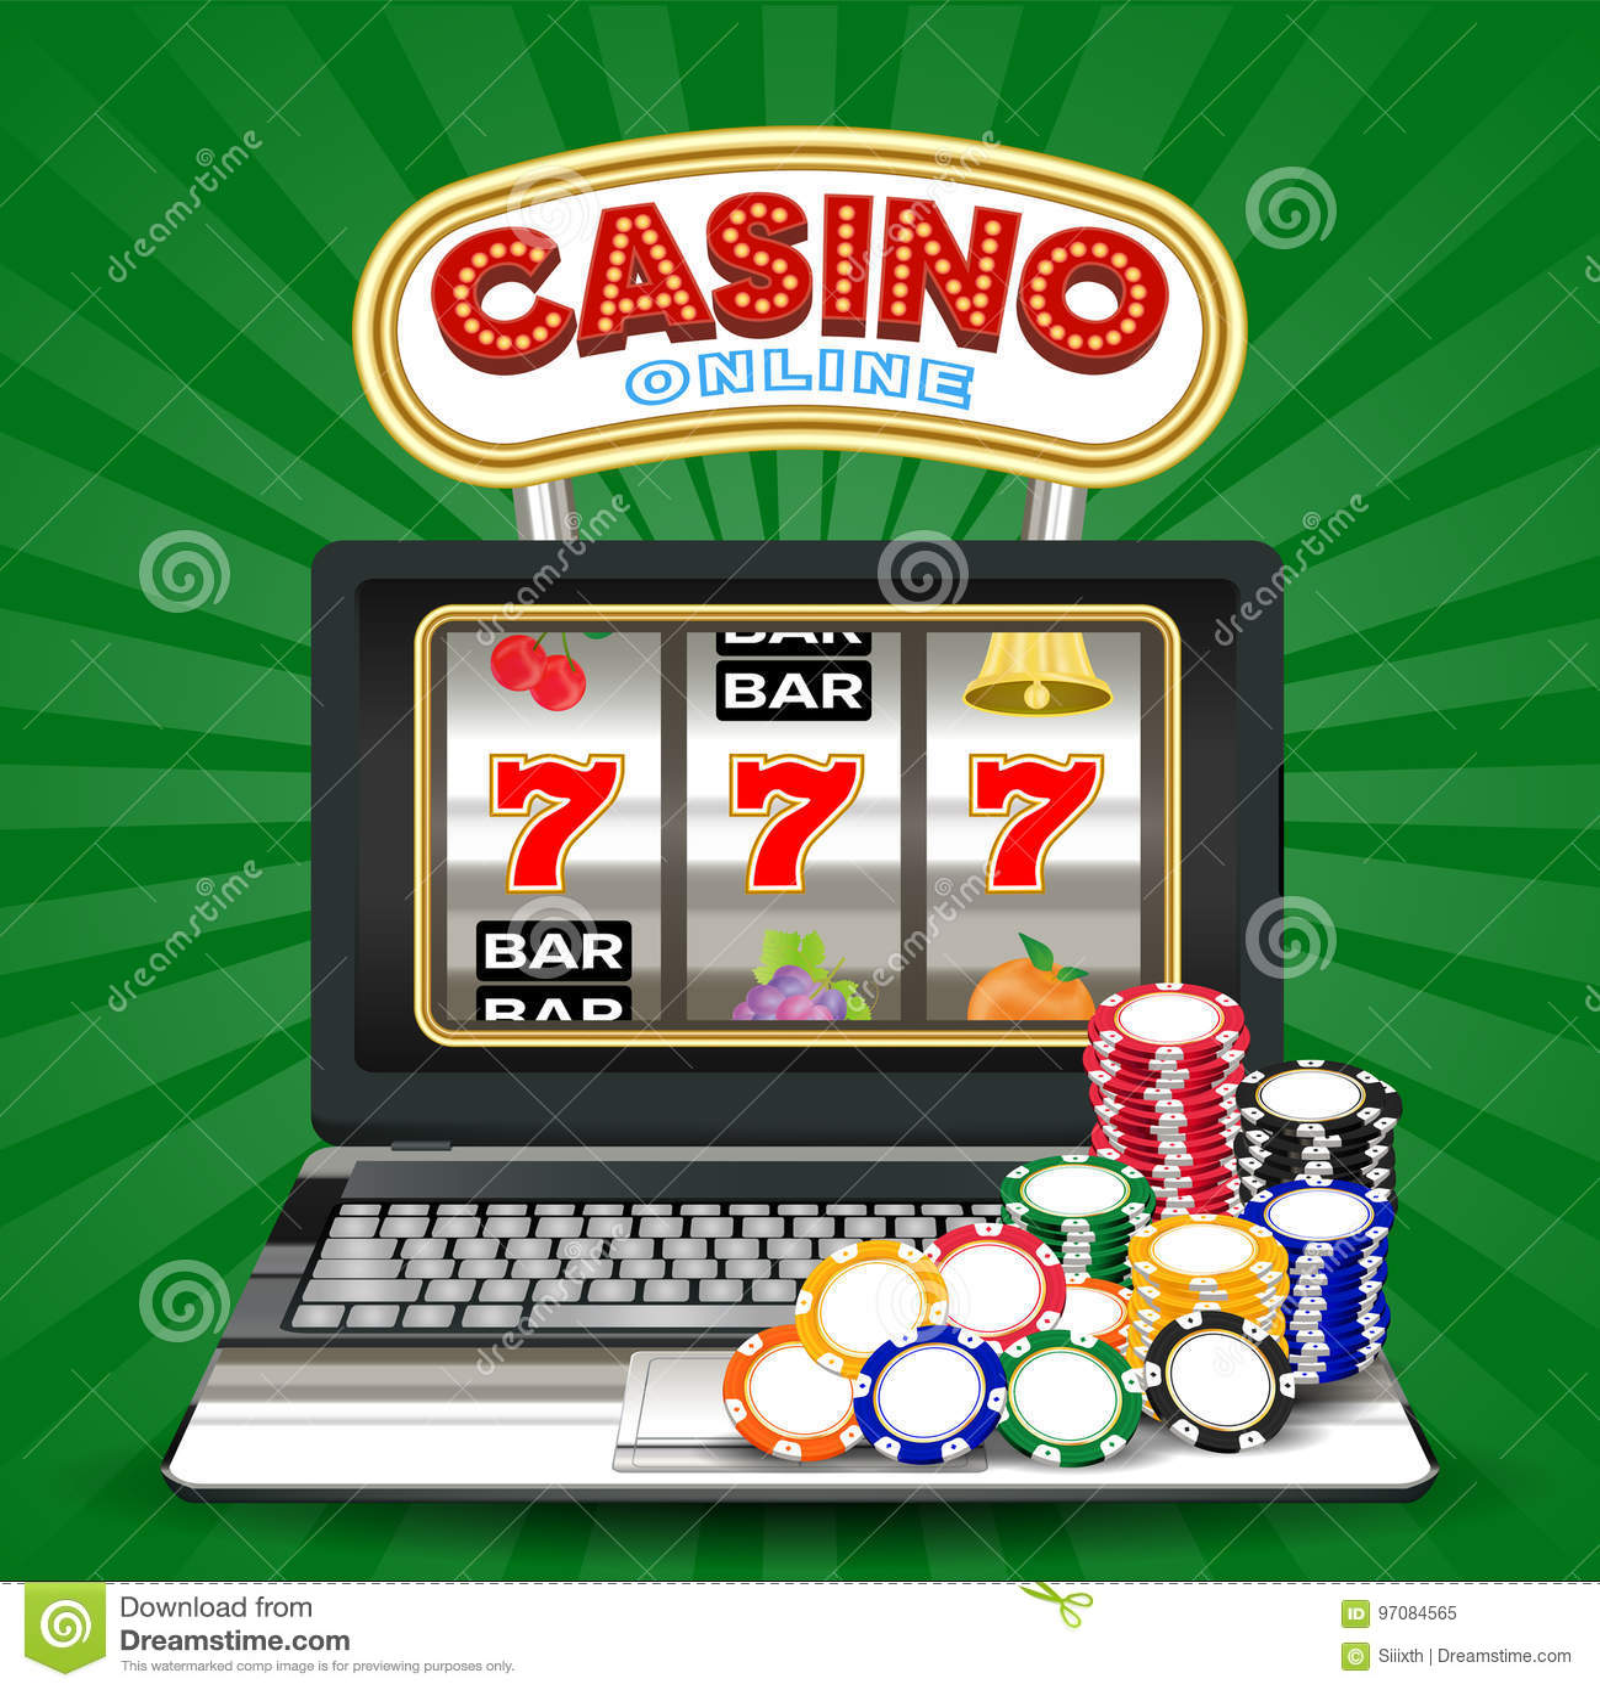 Казино на компьютер бесплатно покер онлайн вывод яндекс